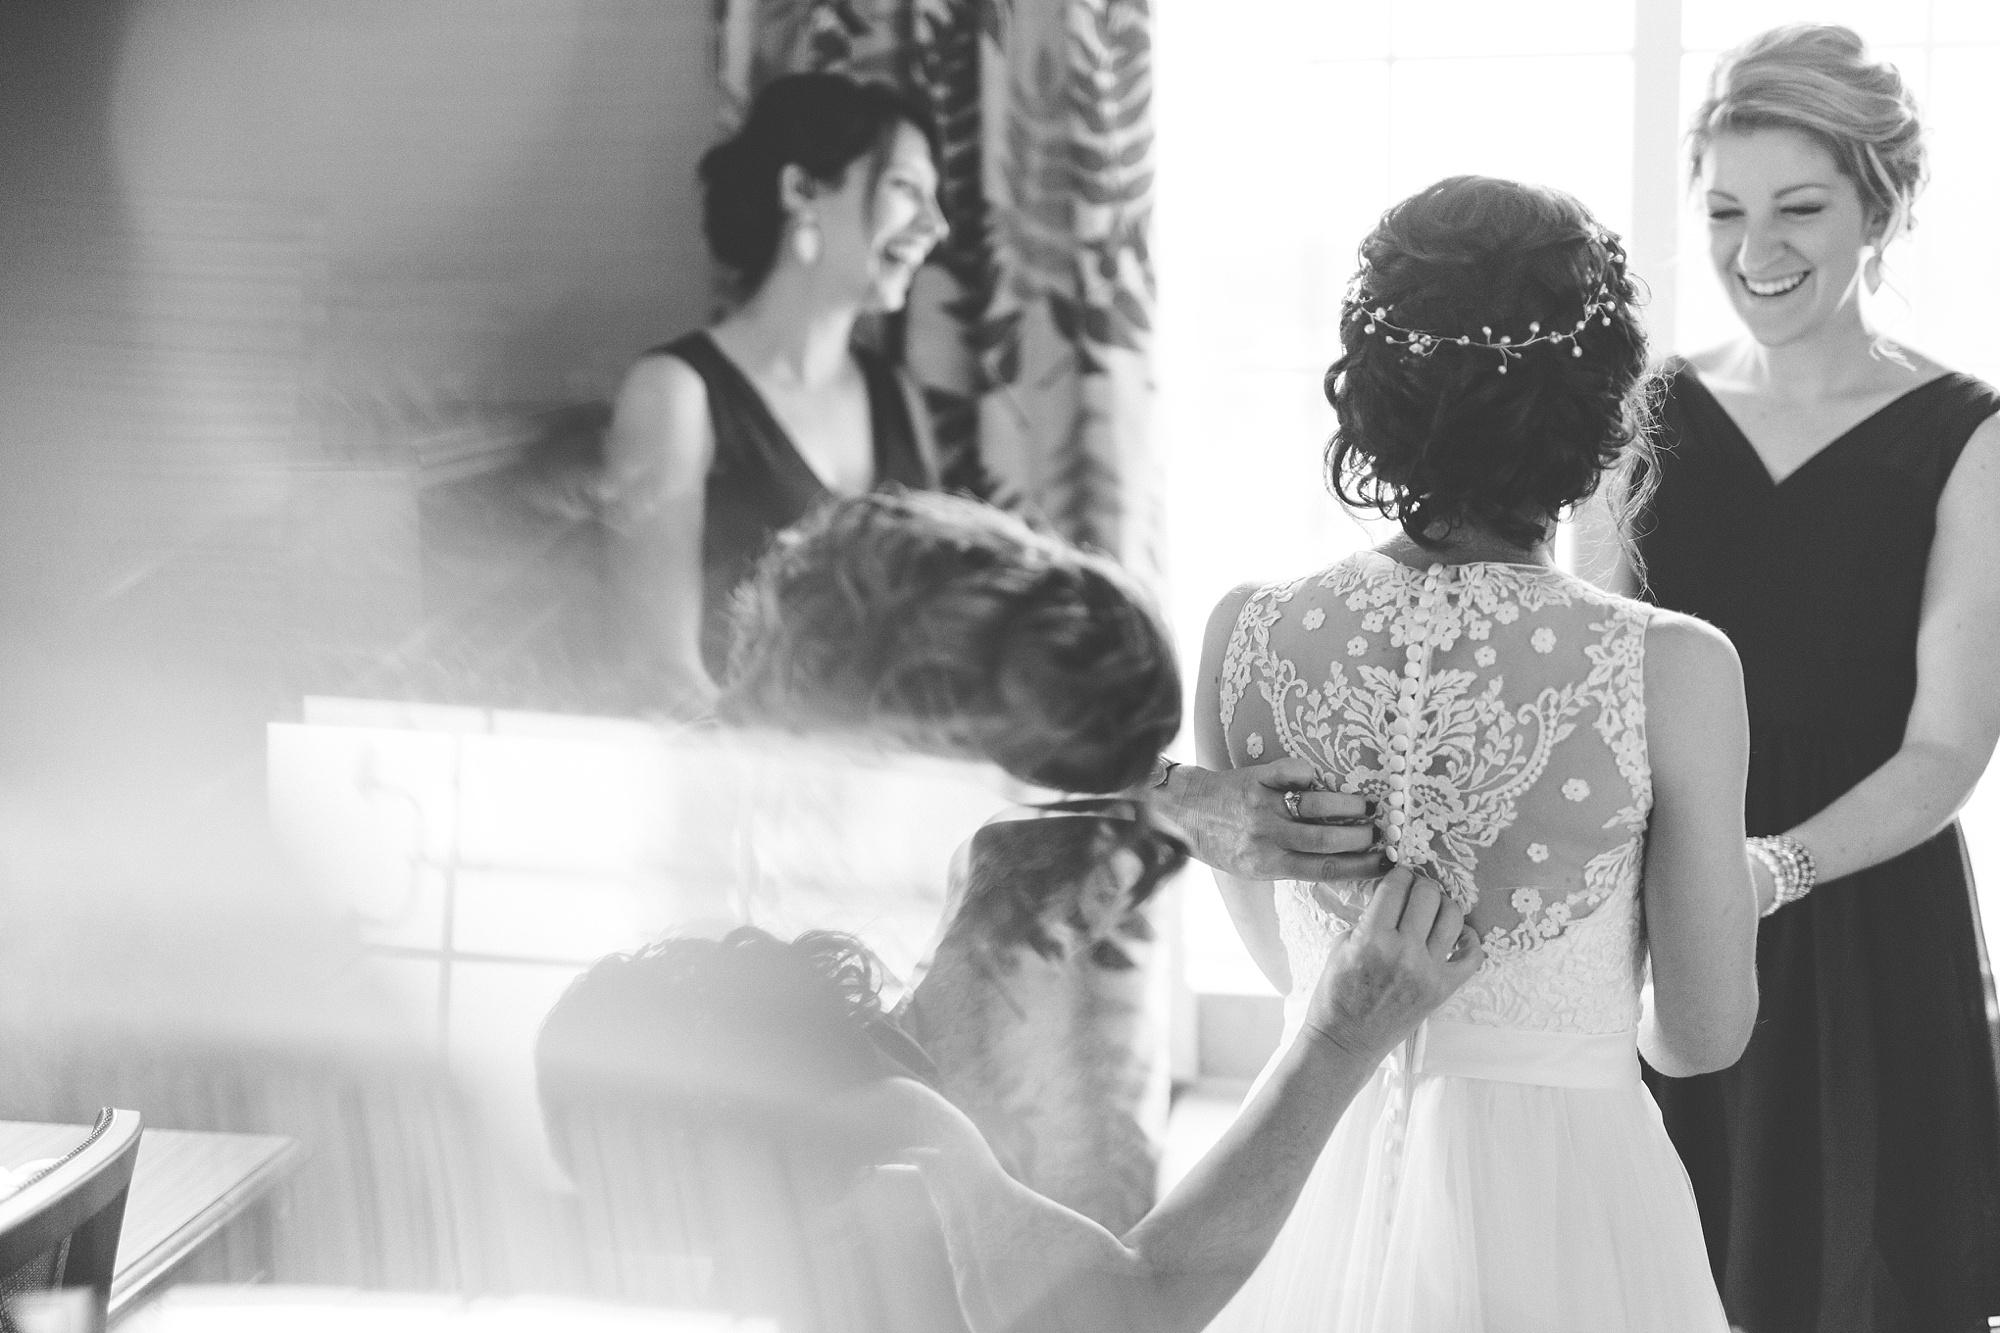 Brandon_Shafer_Photography_Lauren_Ethan_New_Vintage_Place_Grand_Rapids_Wedding_0016.jpg